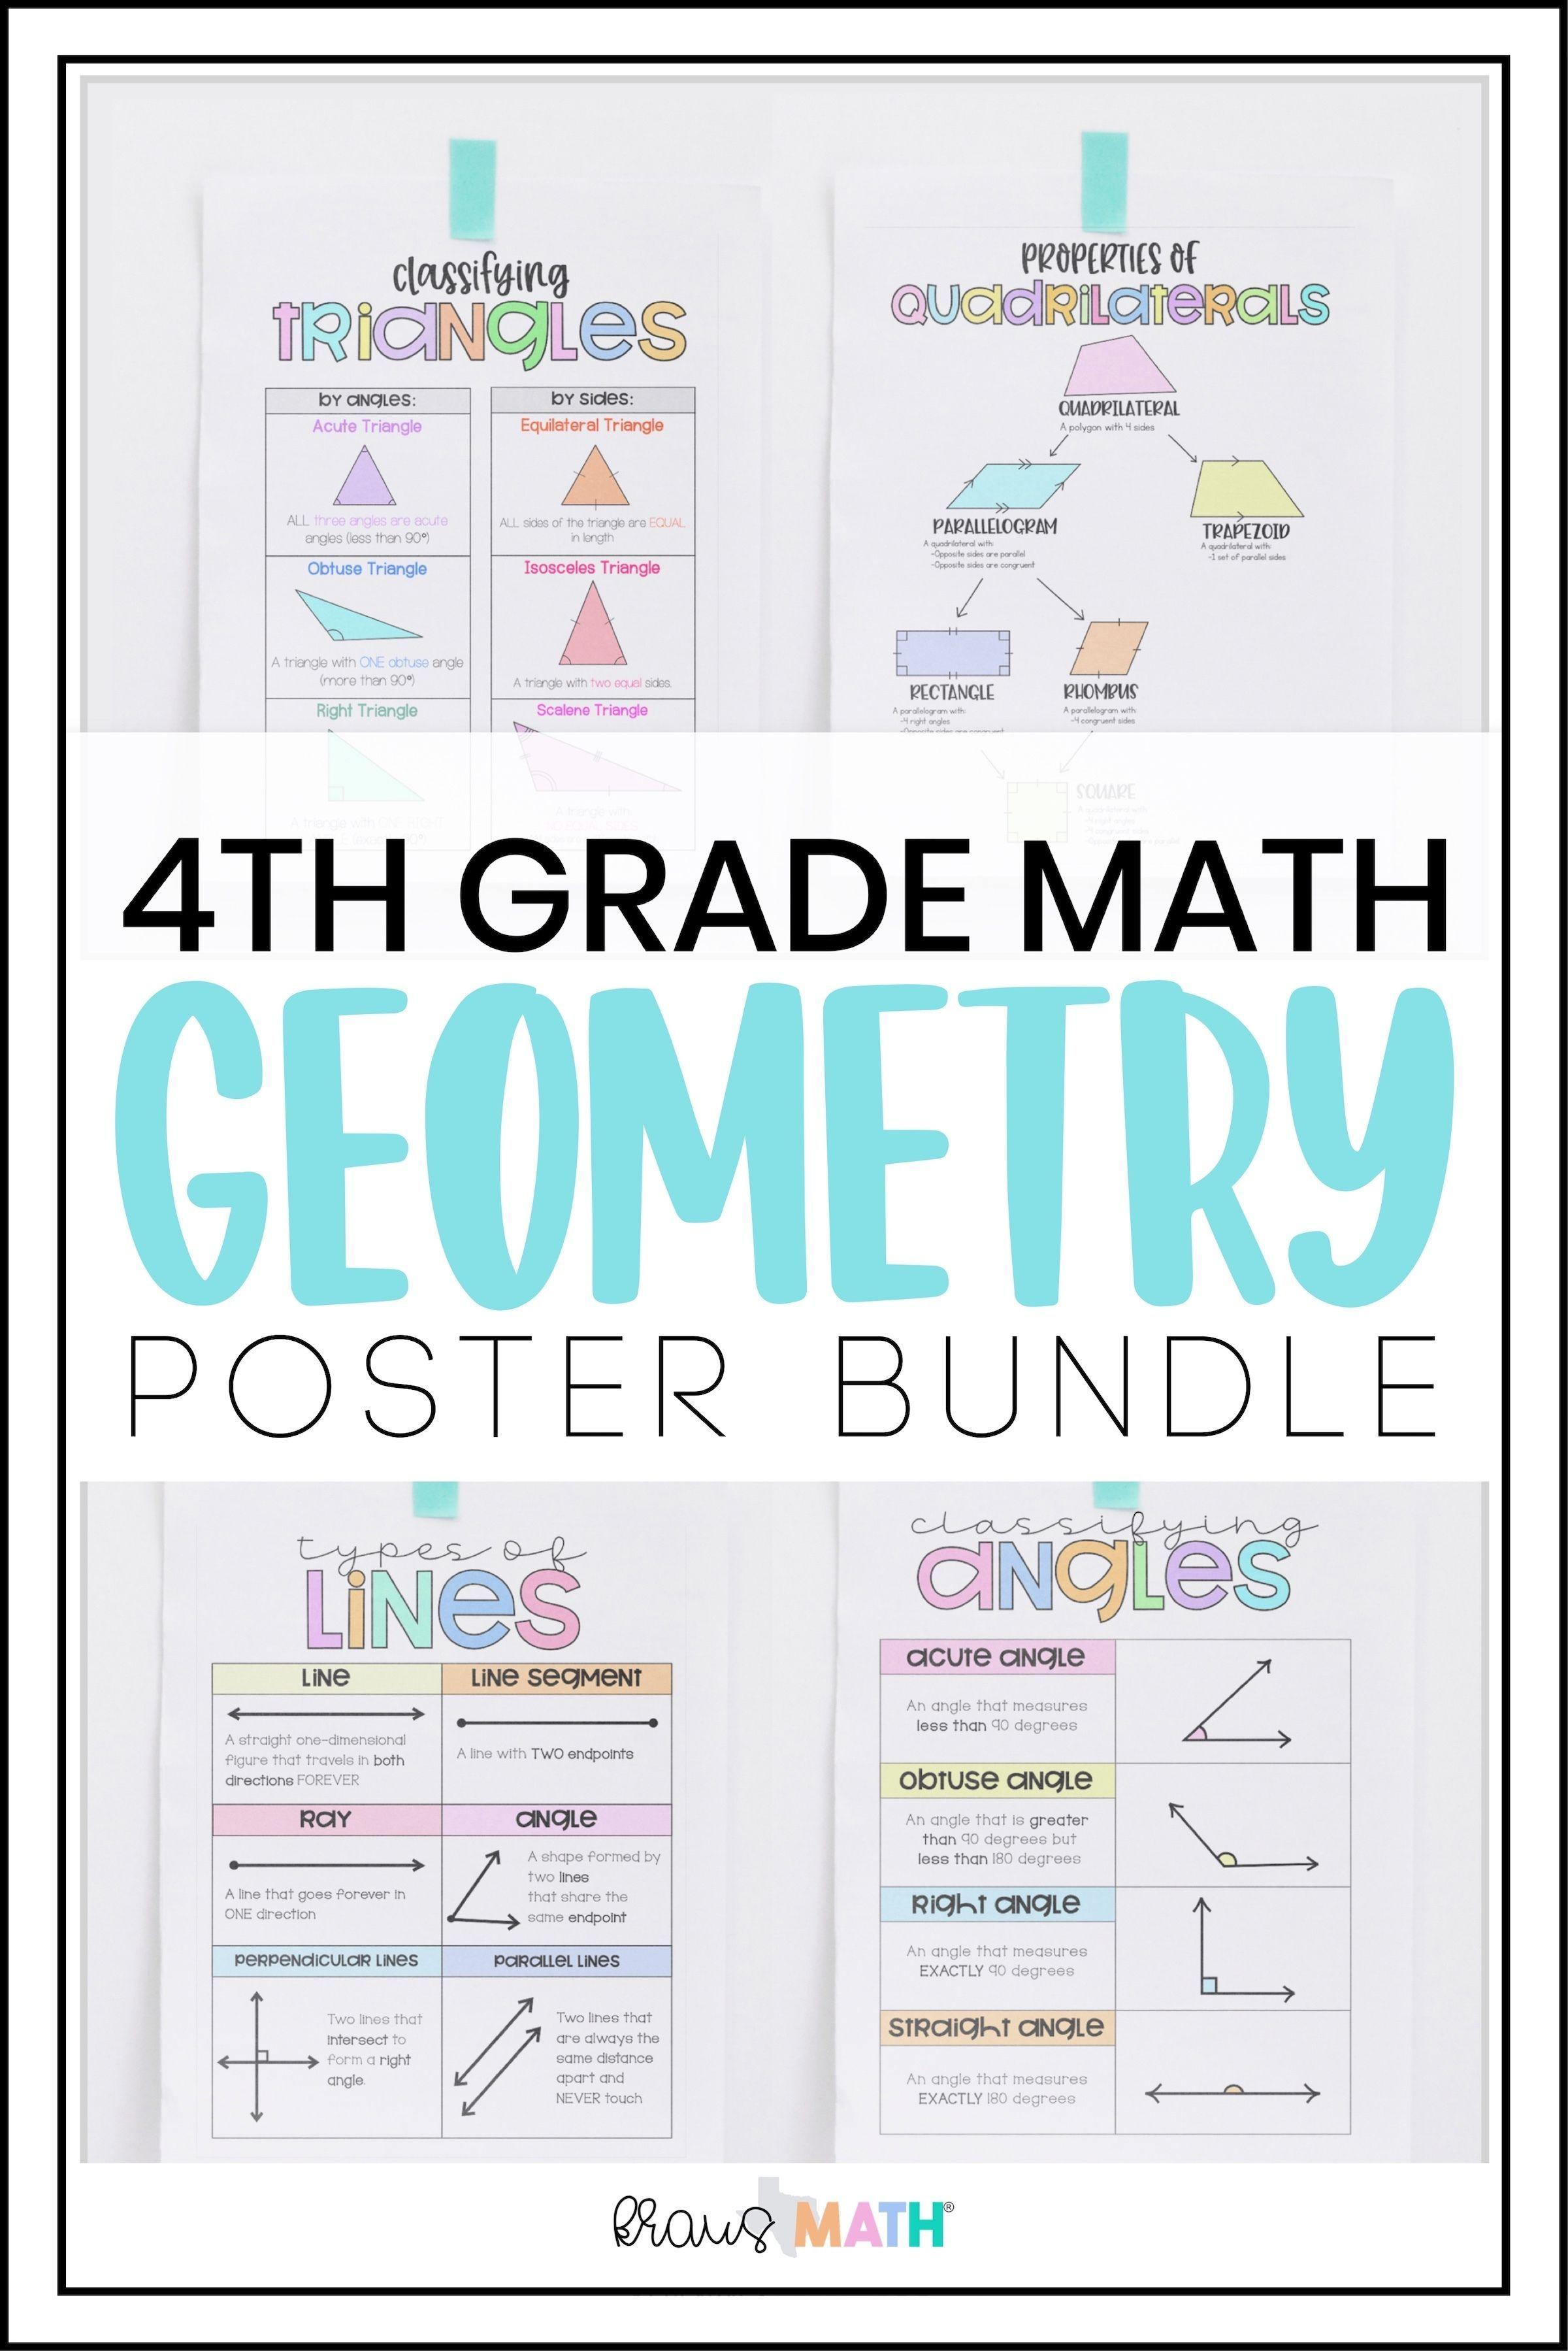 4th Grade Math Posters Geometry Bundle Kraus Math In 2020 4th Grade Math Elementary Math Math Facts